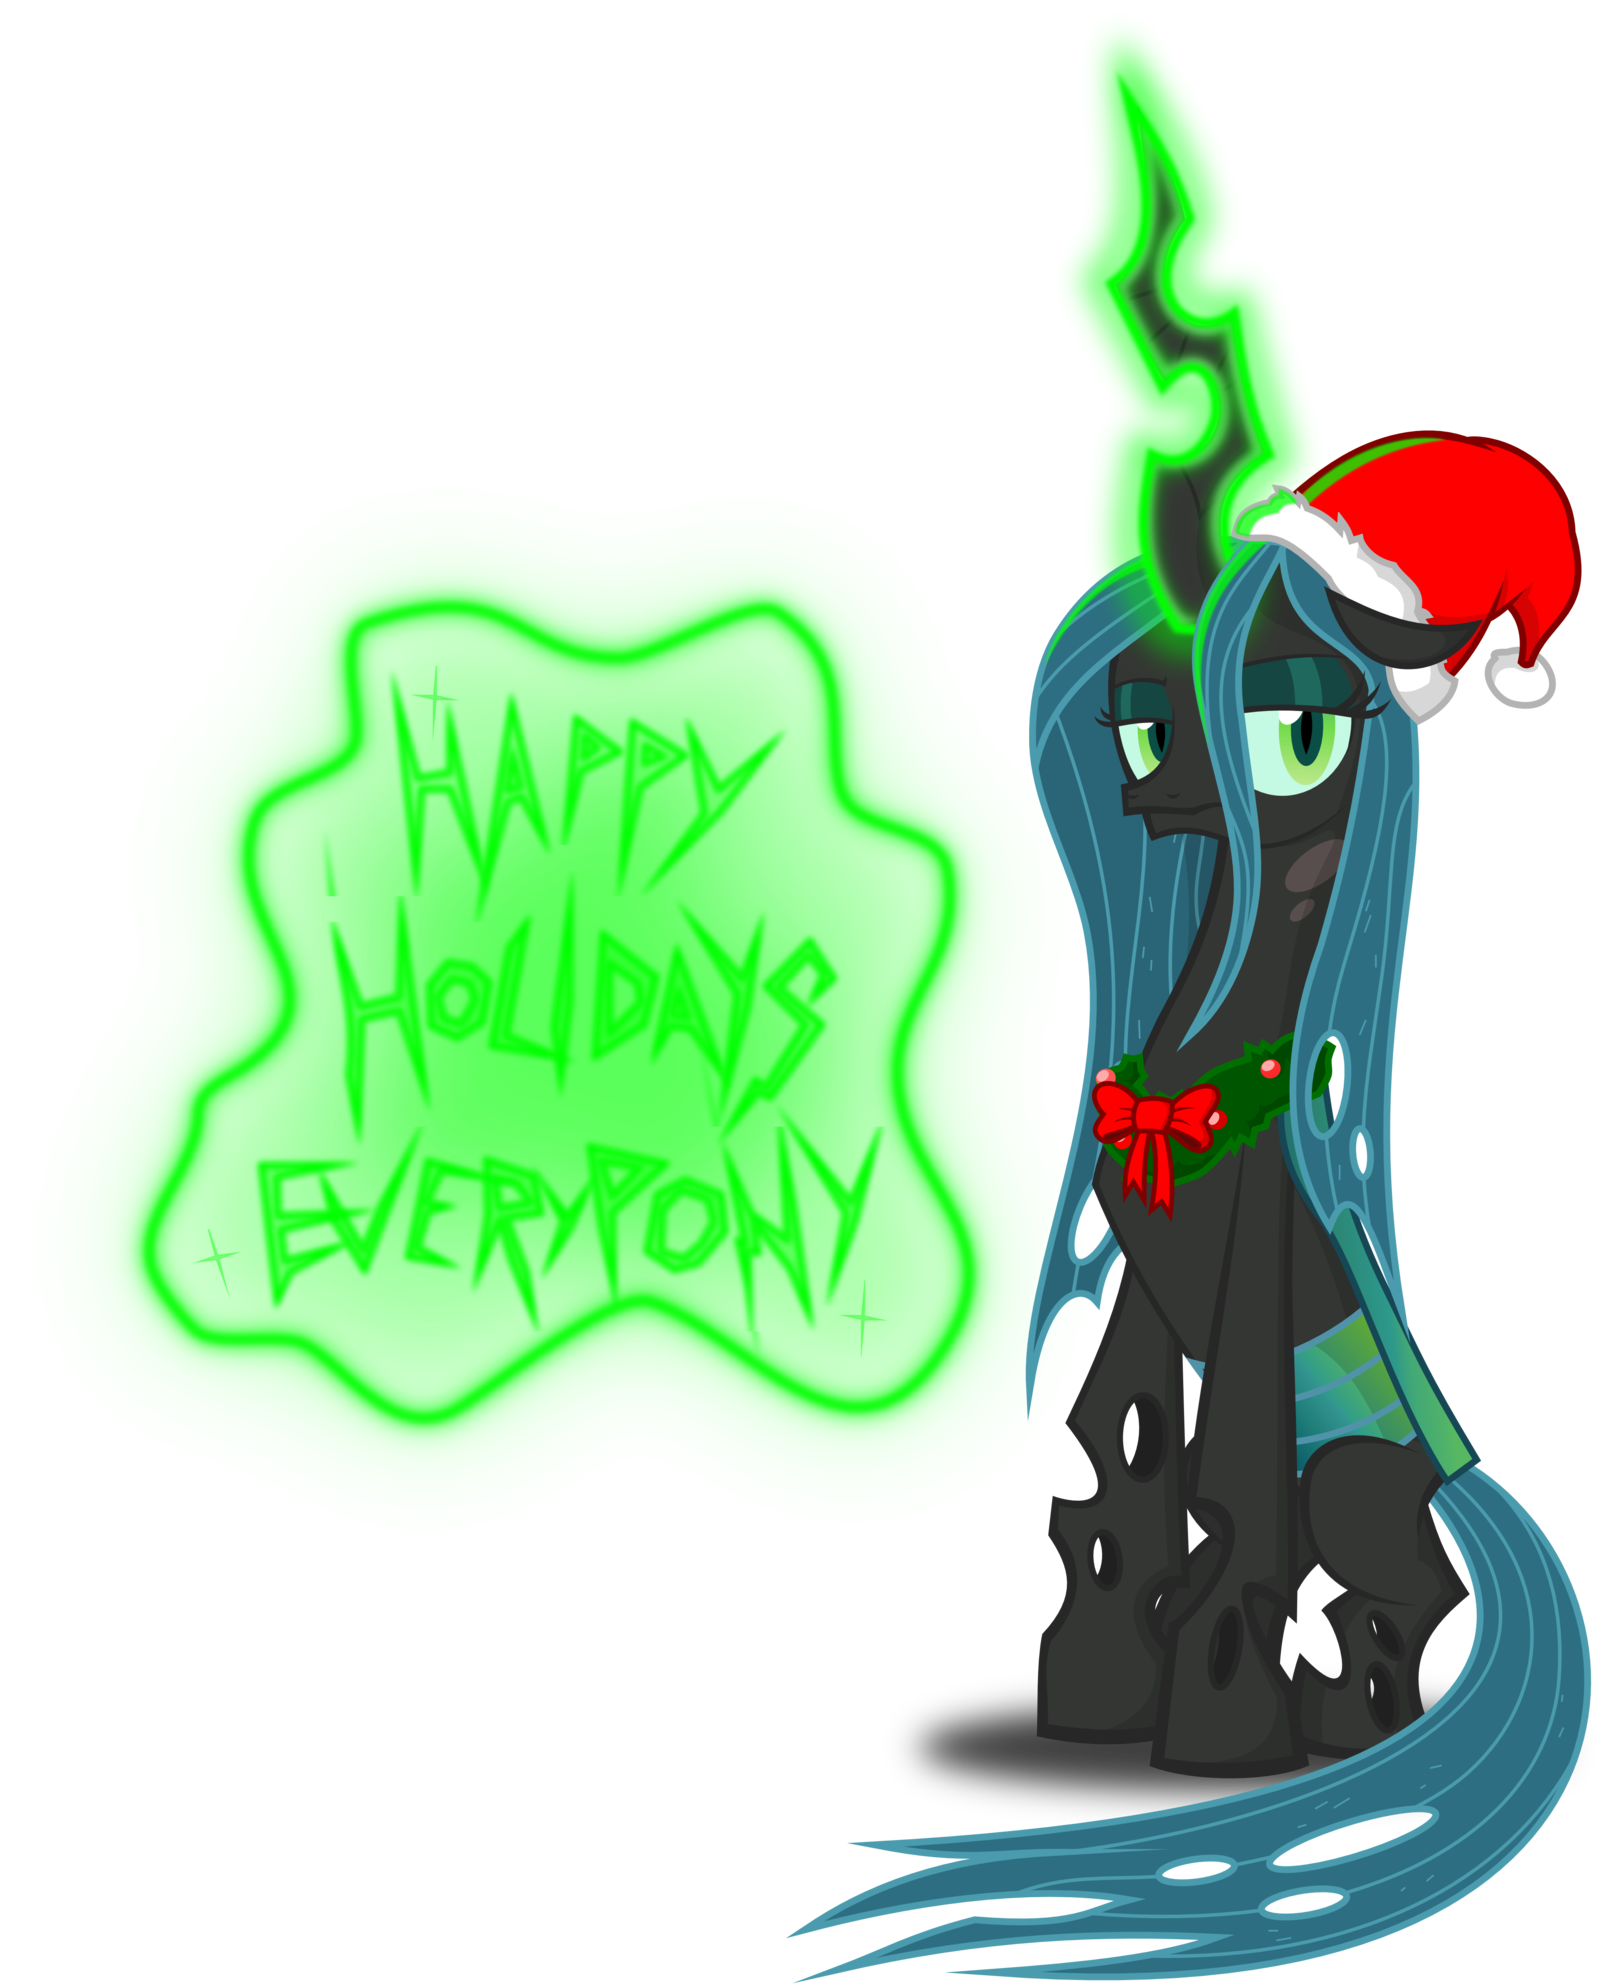 Queen clipart little queen. Image chrysalis christmas pony